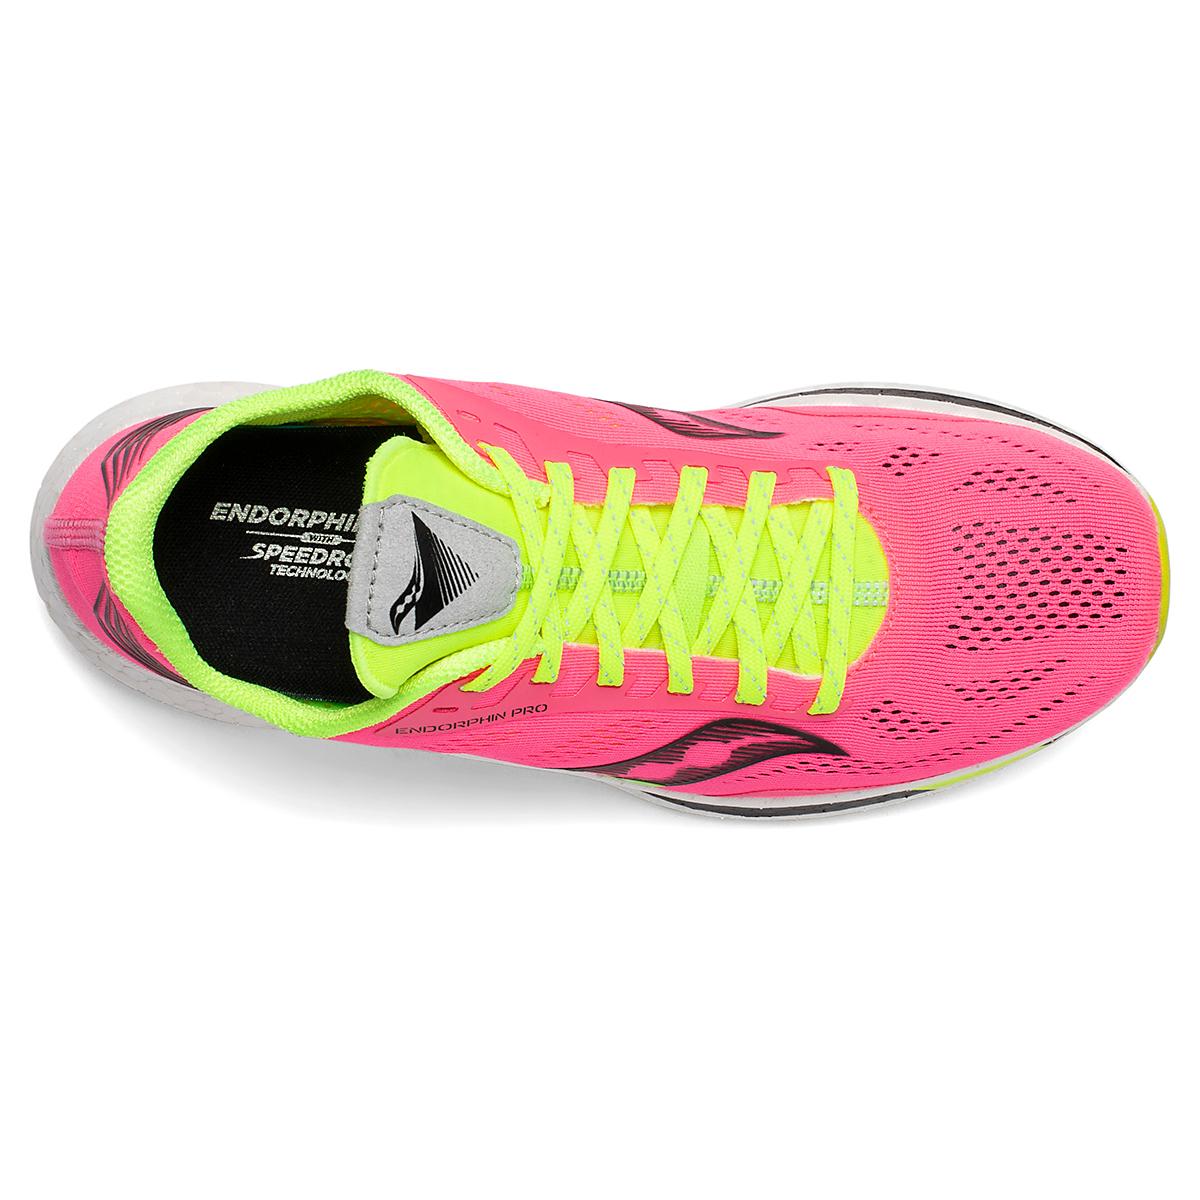 Women's Saucony VIZIPRO Speed Endorphin Pro Running Shoe - Color: Vizi Pink - Size: 5 - Width: Regular, Vizi Pink, large, image 3